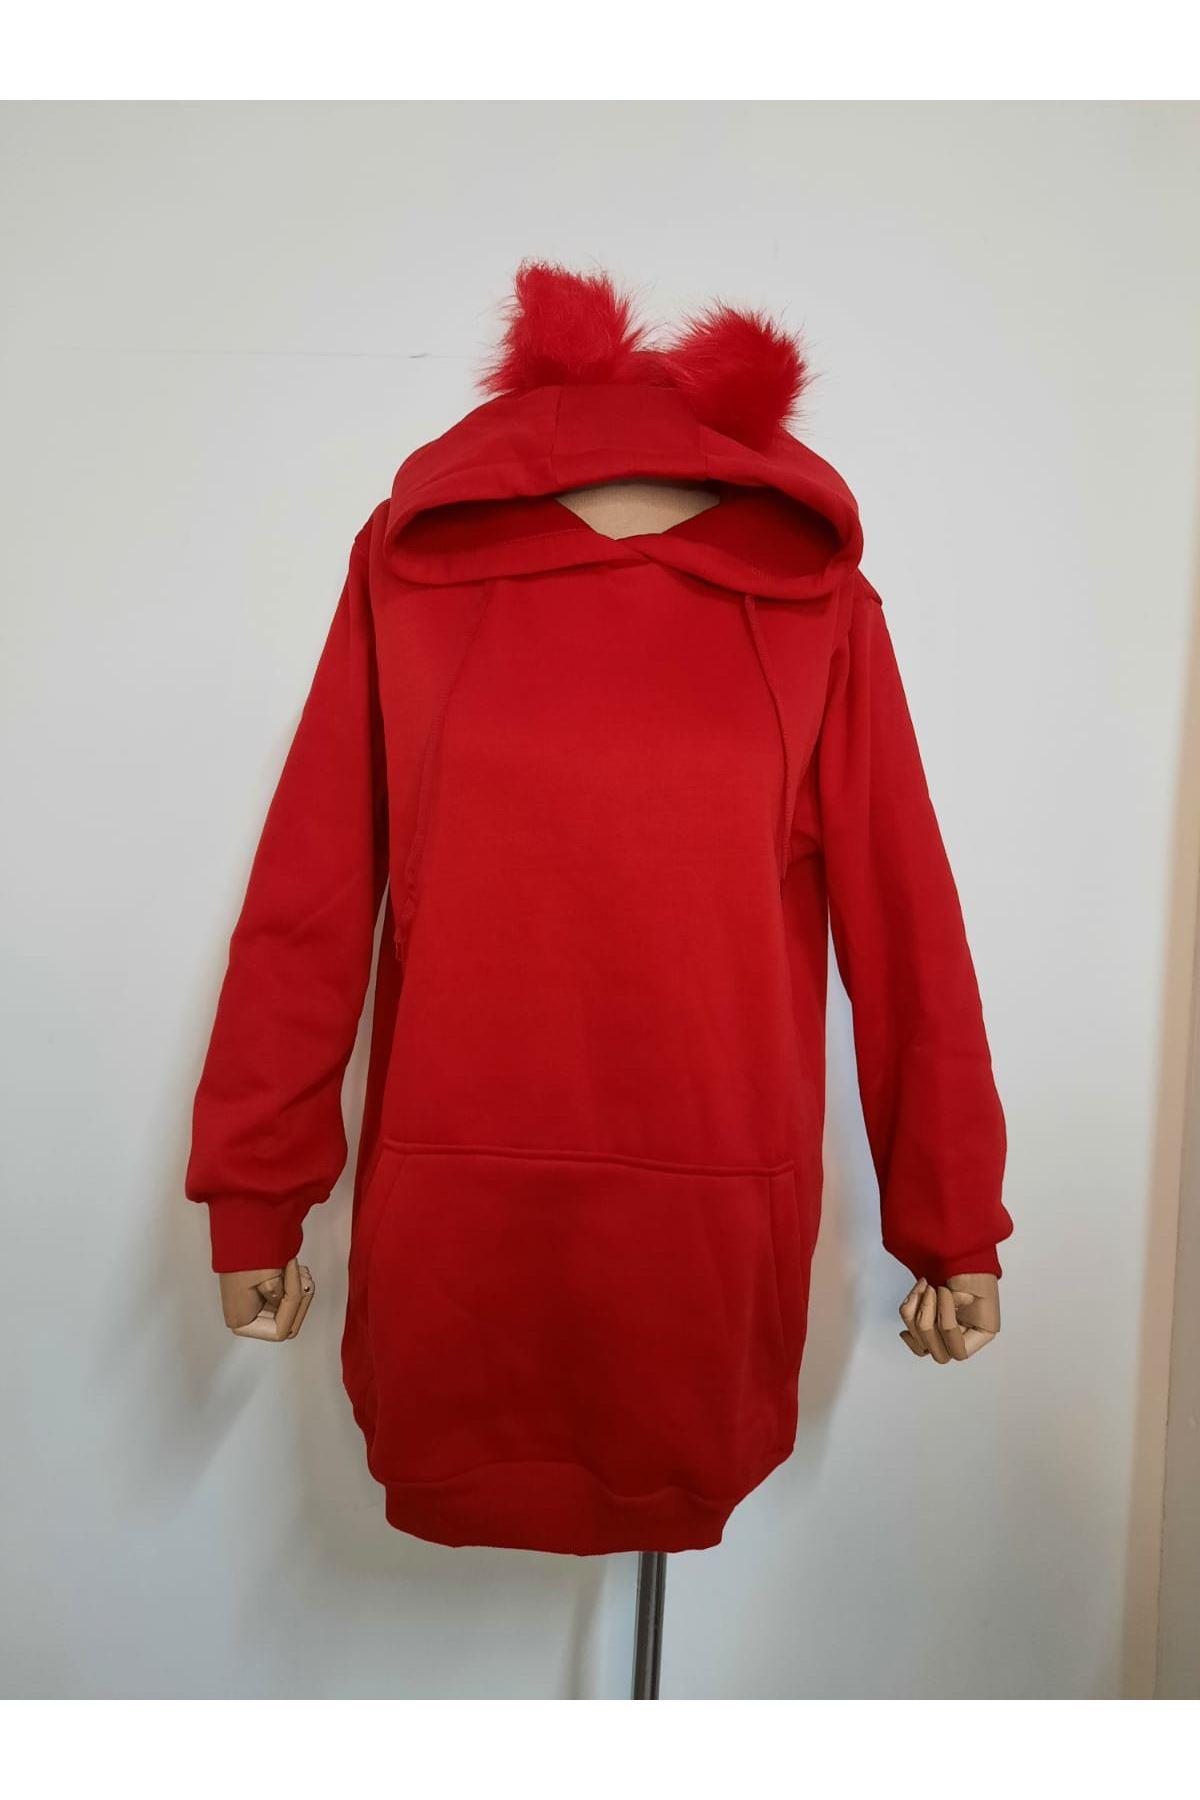 Ponpon Kapüşonlu Sweatshirt - Kırmızı